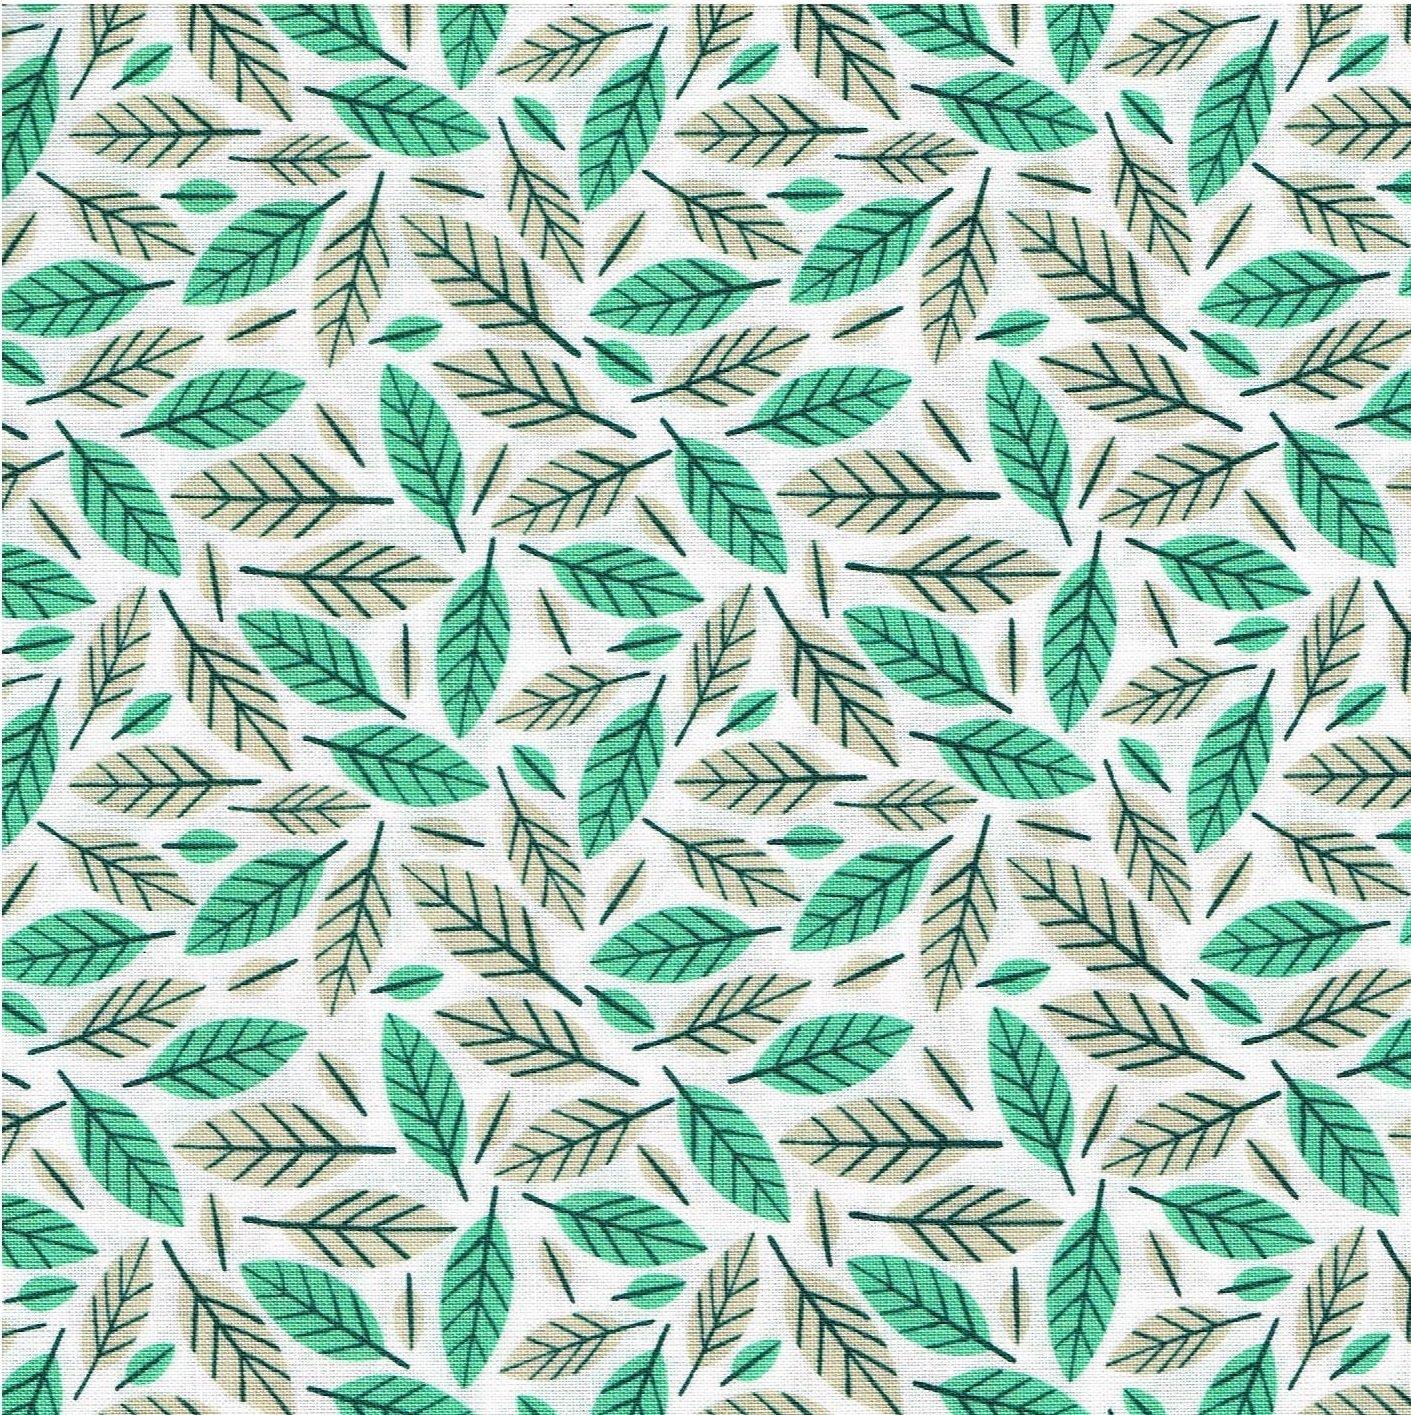 Green Leaves M 16702-11